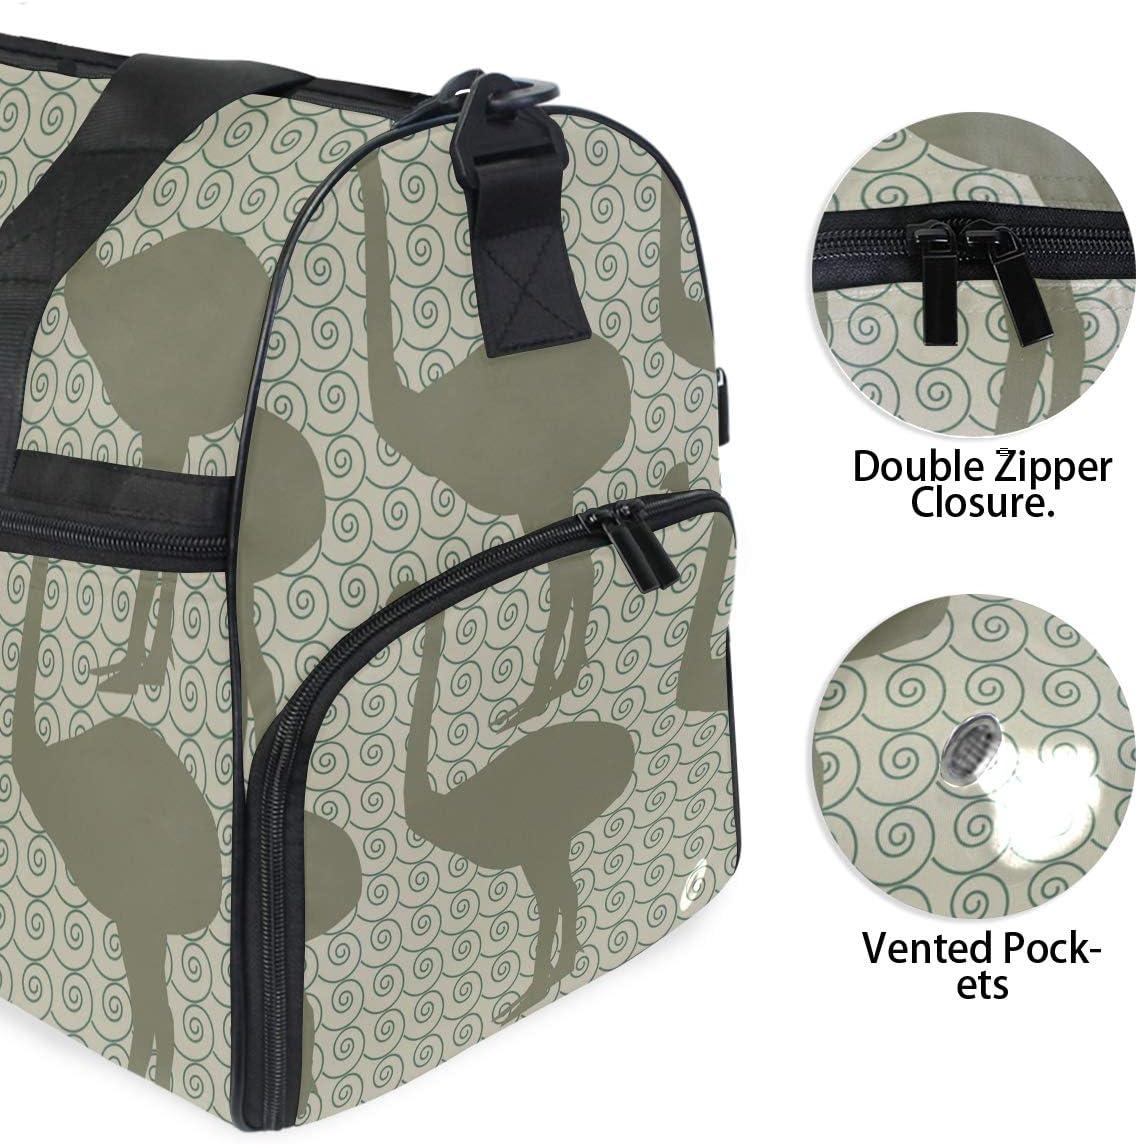 MALPLENA Extinct Animals Inspired Fabric Designs Packable Duffle Bag For Men Women Tear Resistant Sports Duffle